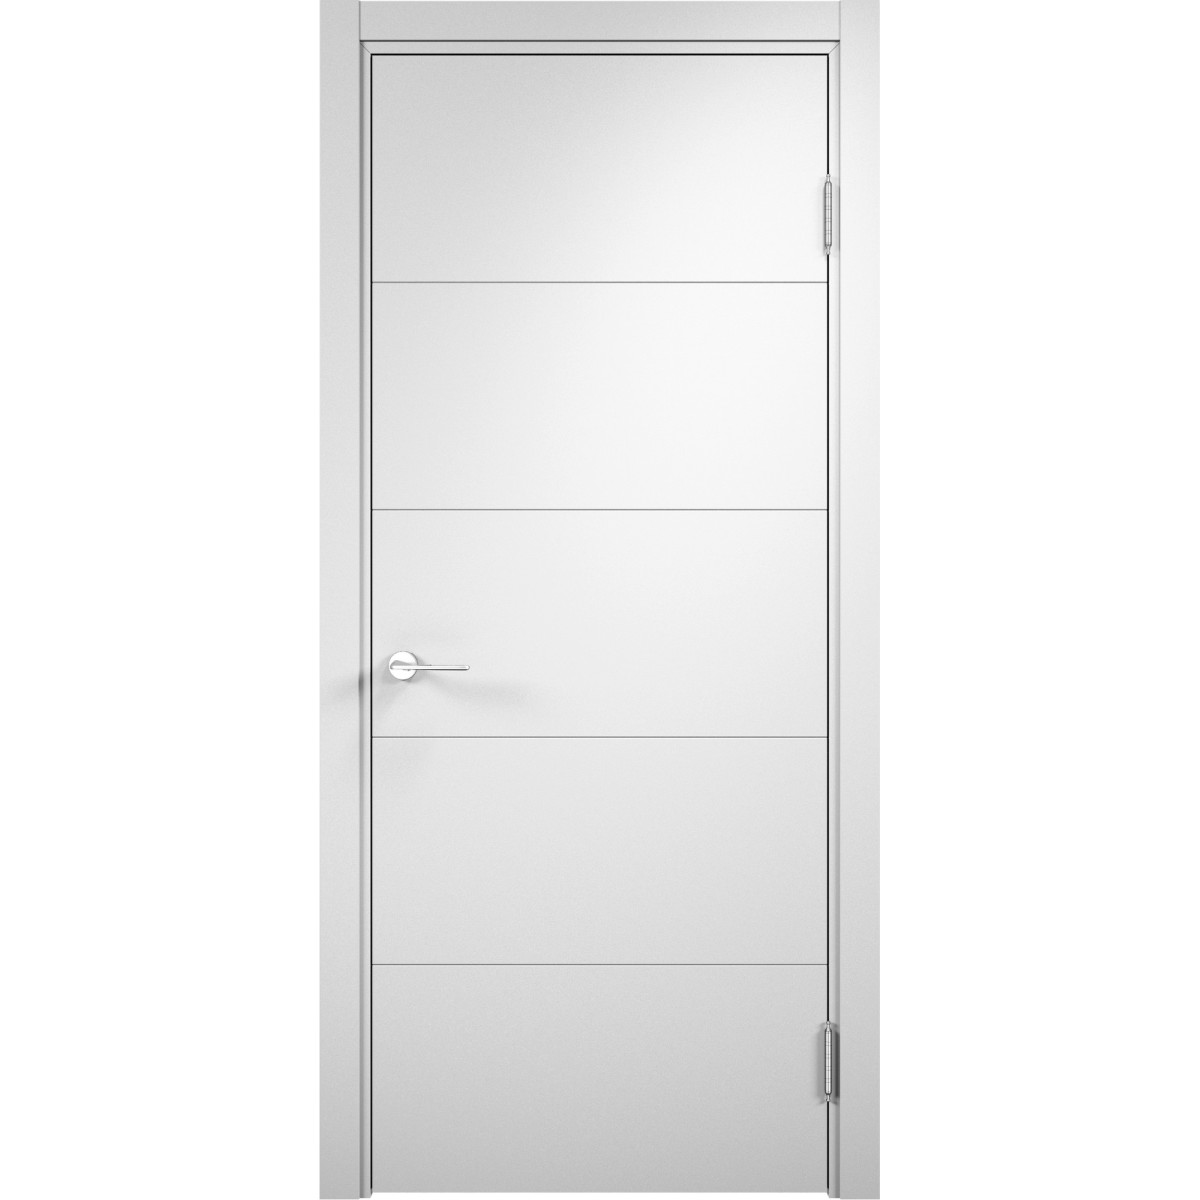 Дверь Межкомнатная Глухая Турин 90x200 Пвх Цвет Белый